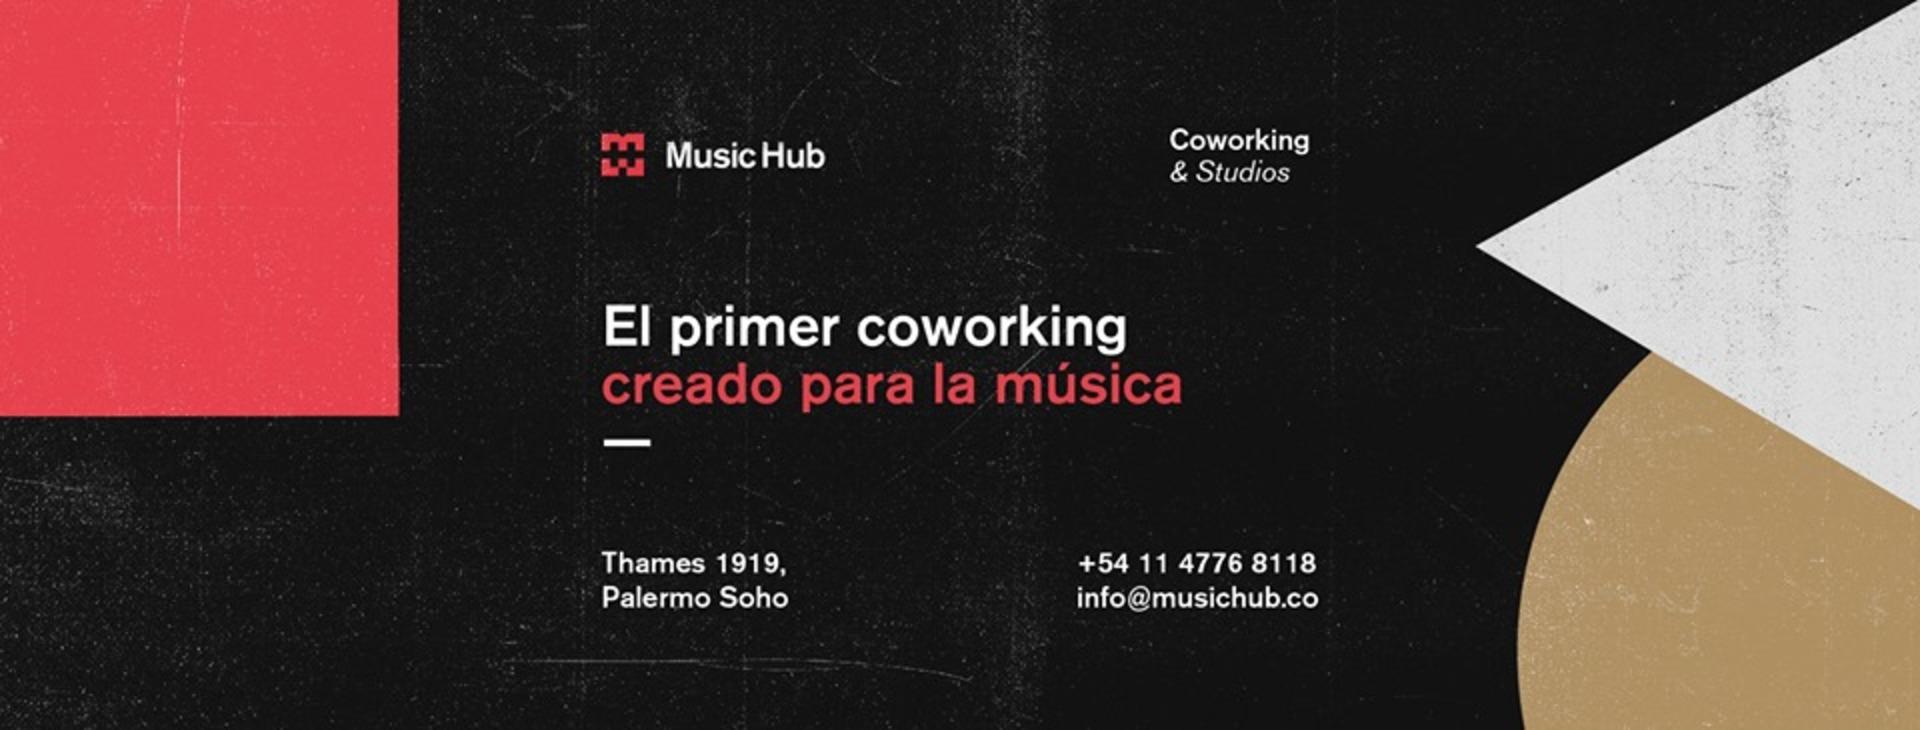 Studio La Rosa Palermo music hub, buenos aires - book online - coworker